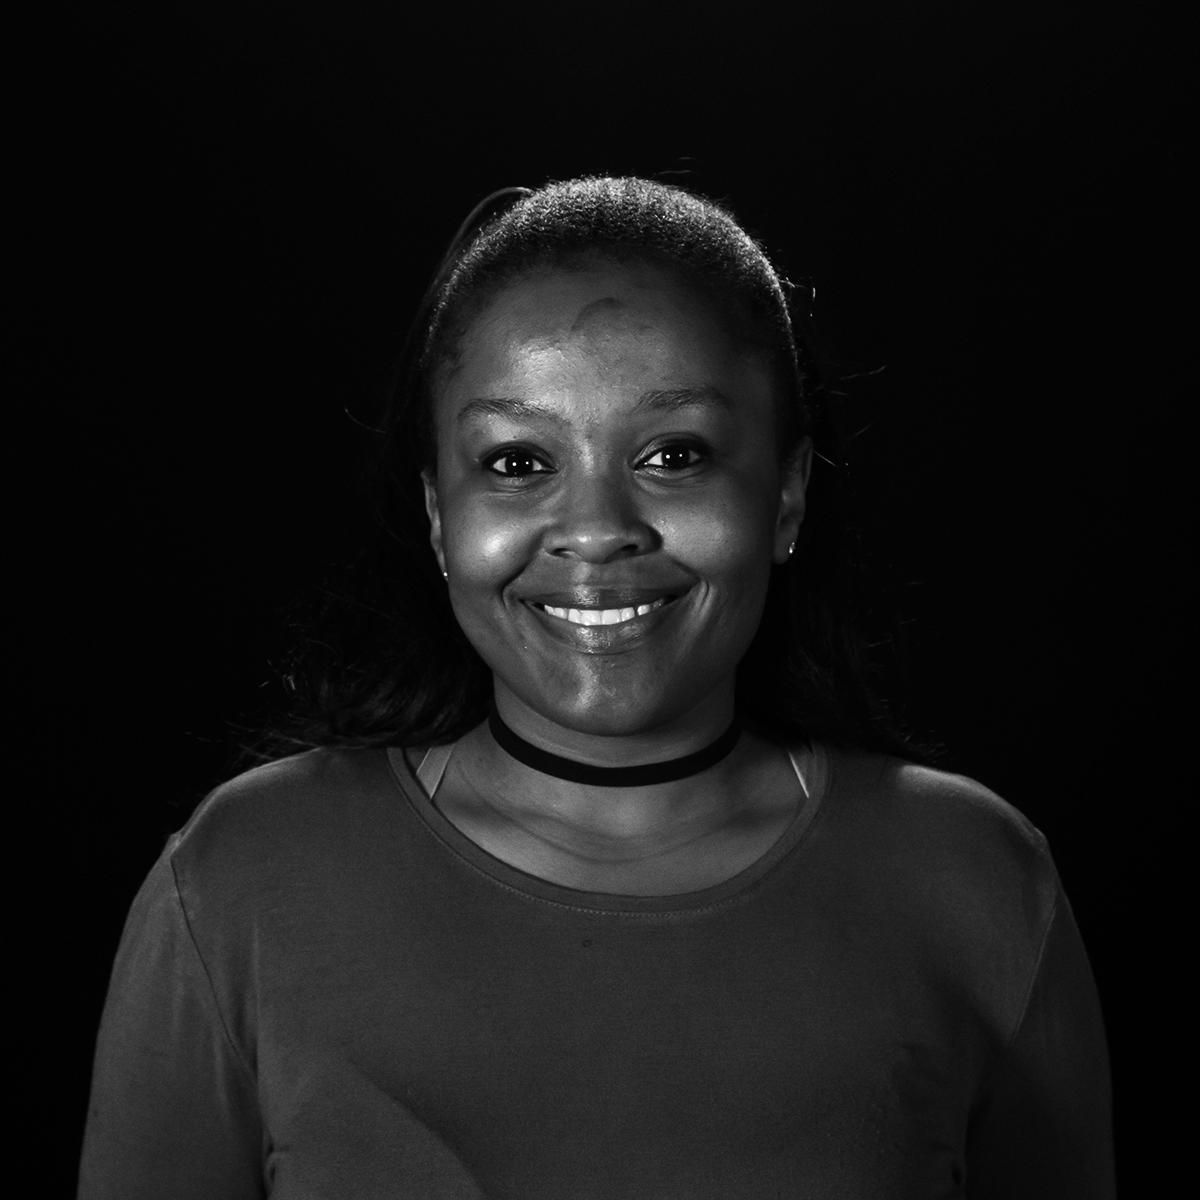 Tebogo Mashego